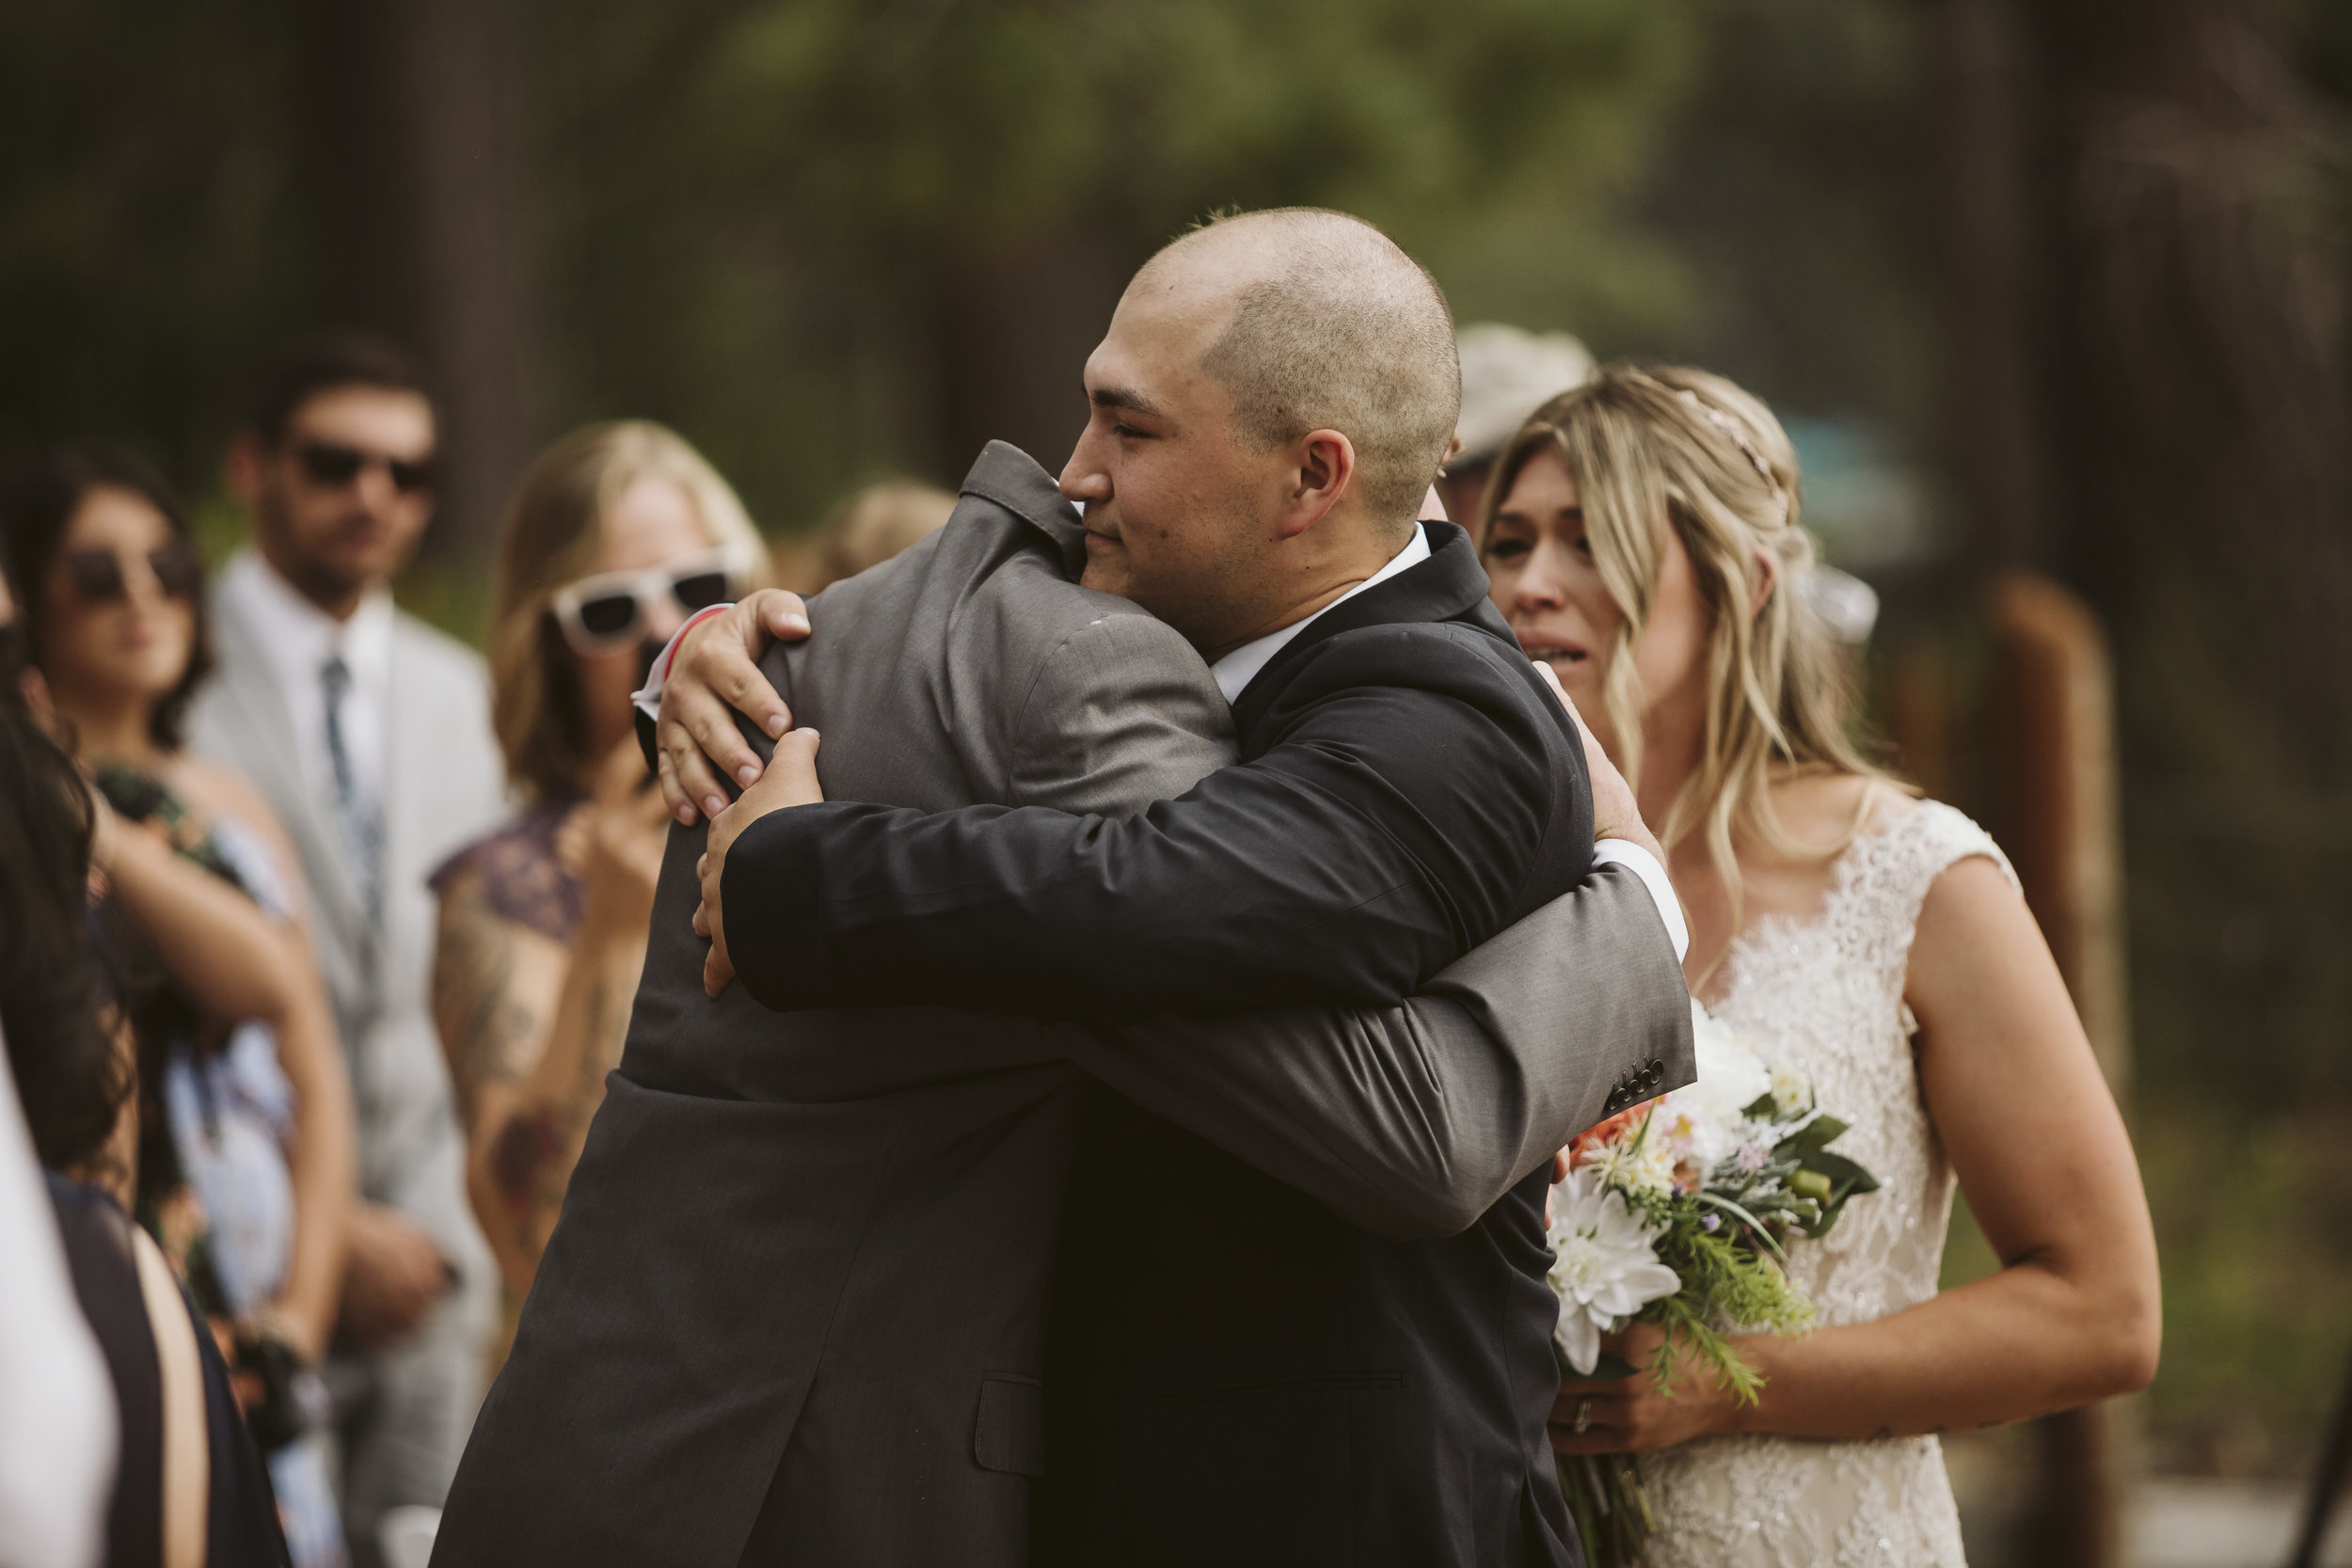 _MG_9636vild-vild photography-photography-wedding-wedding photography-tahoe-lake tahoe-lake tahoe wedding photographer-nevada wedding photographer-mountain wedding.jpg